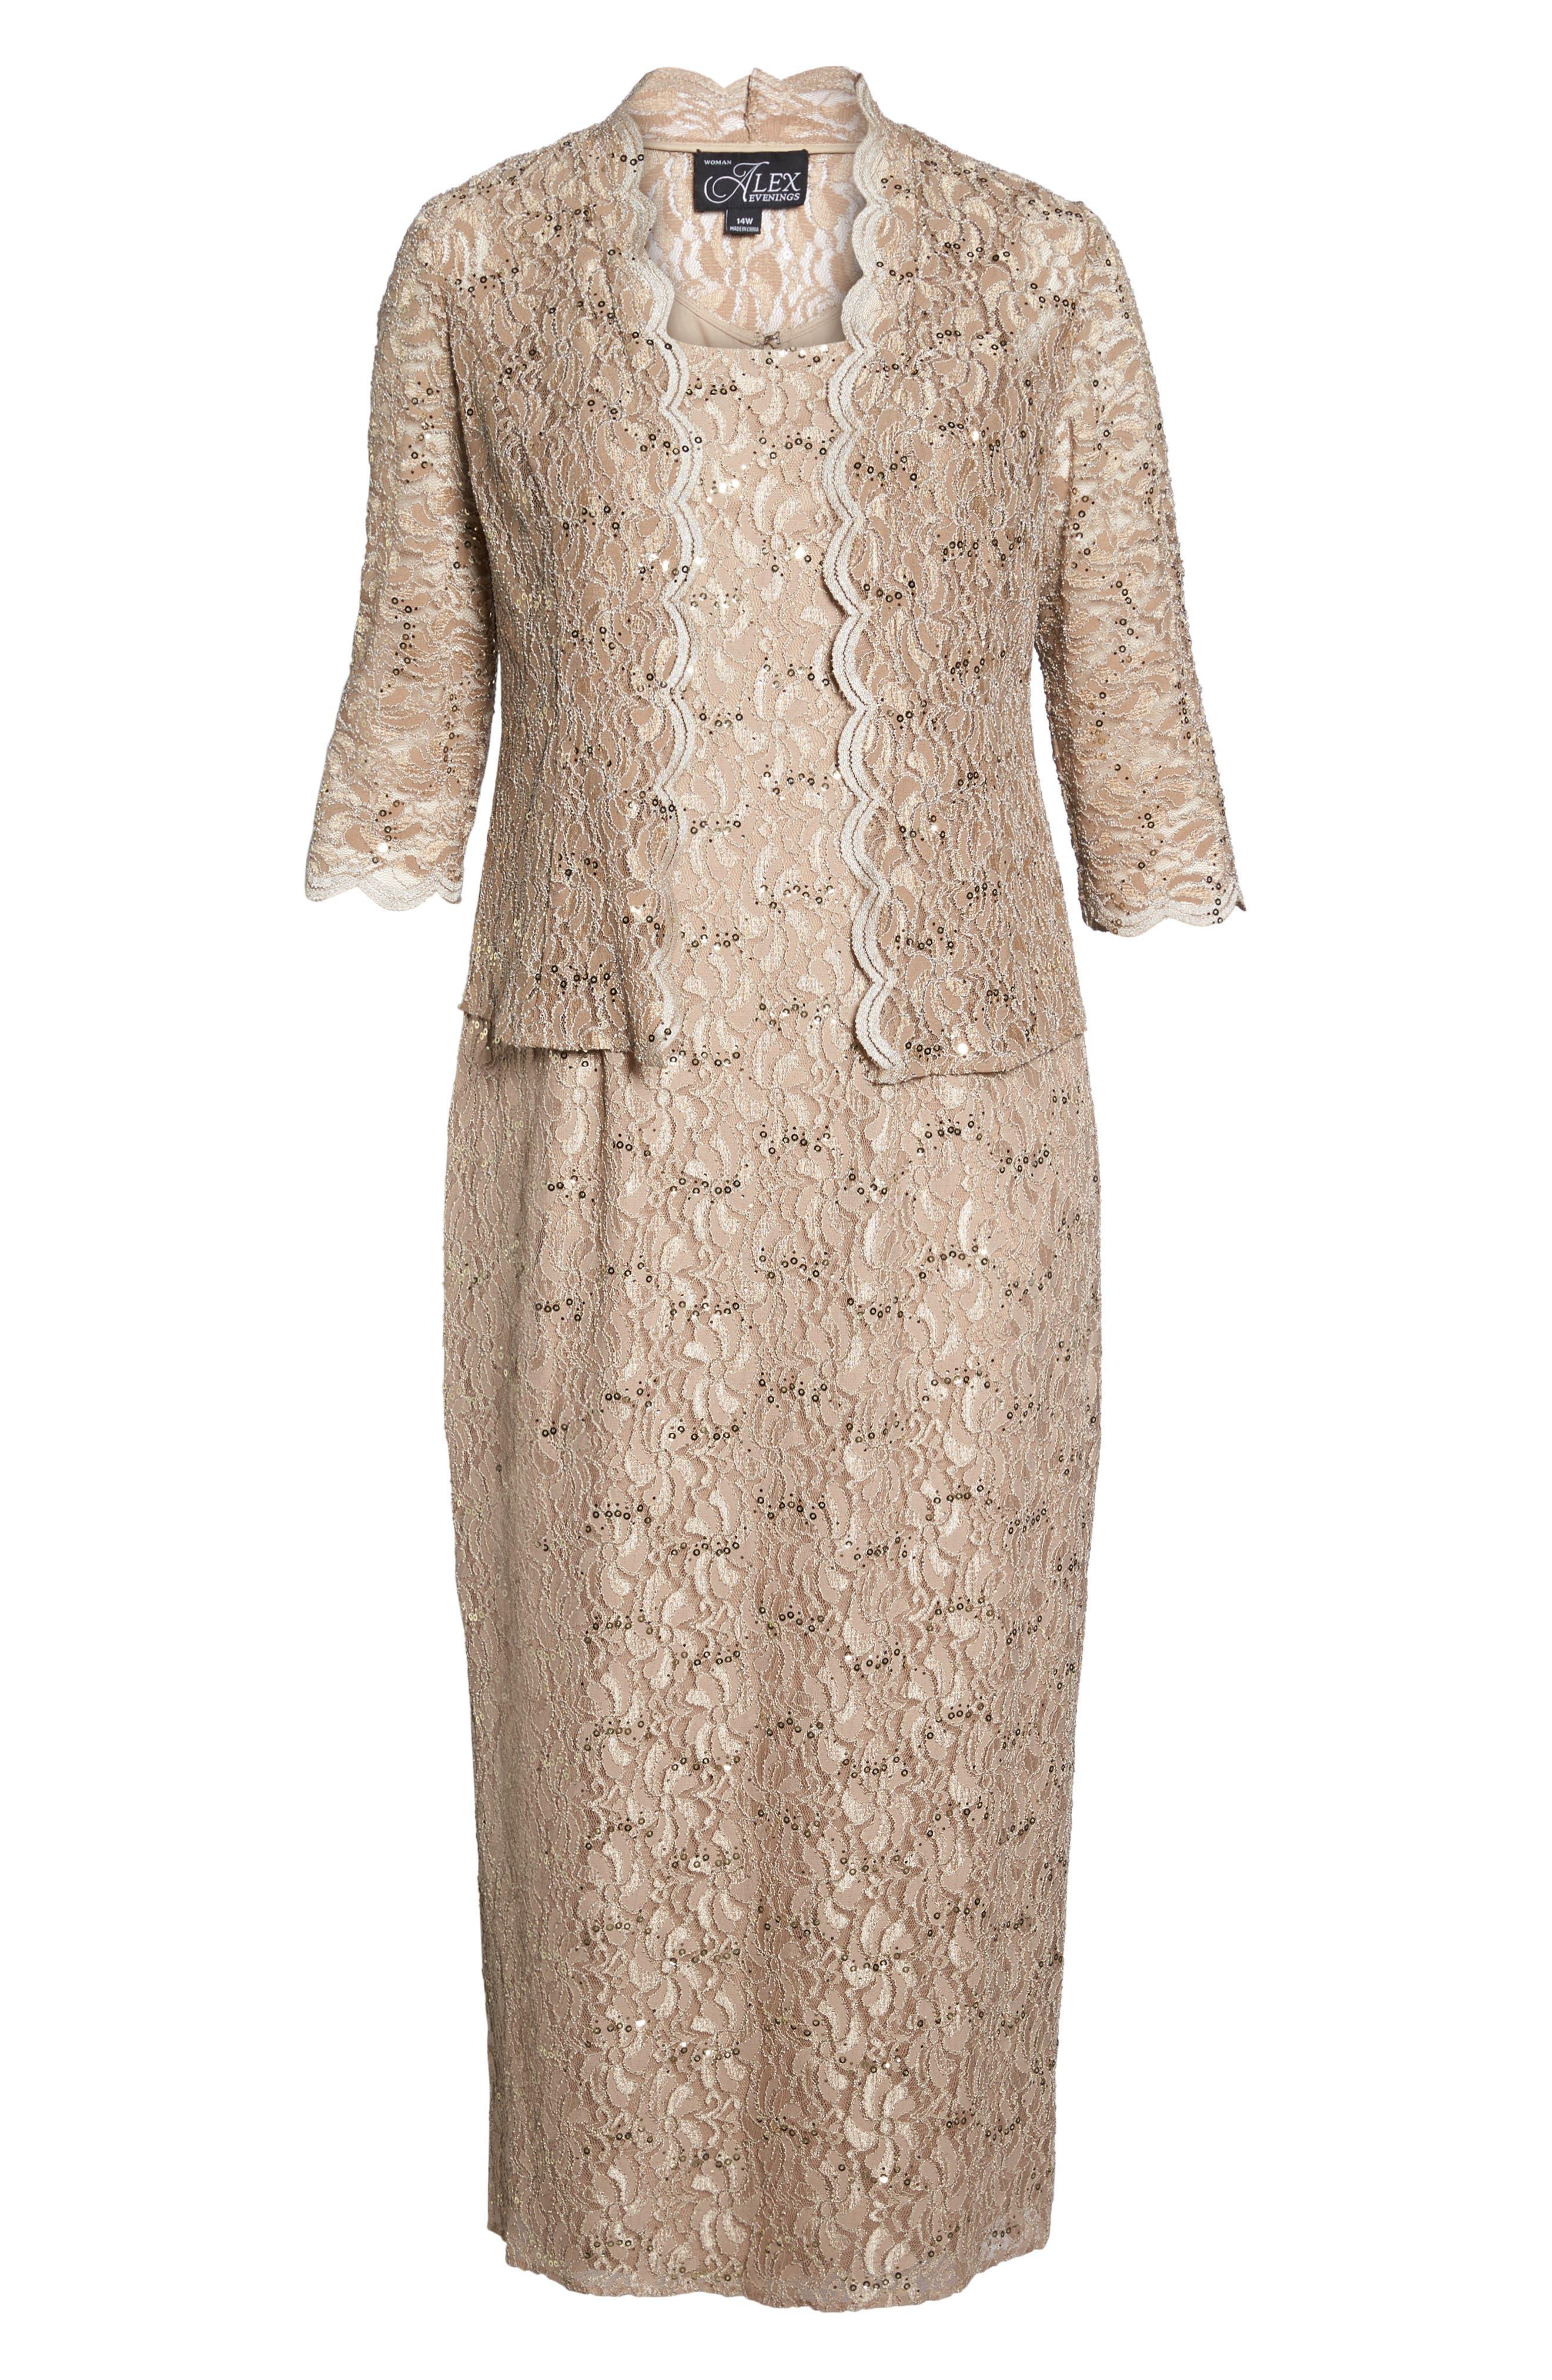 Sequin Lace Gown & Jacket,                             Alternate thumbnail 6, color,                             251